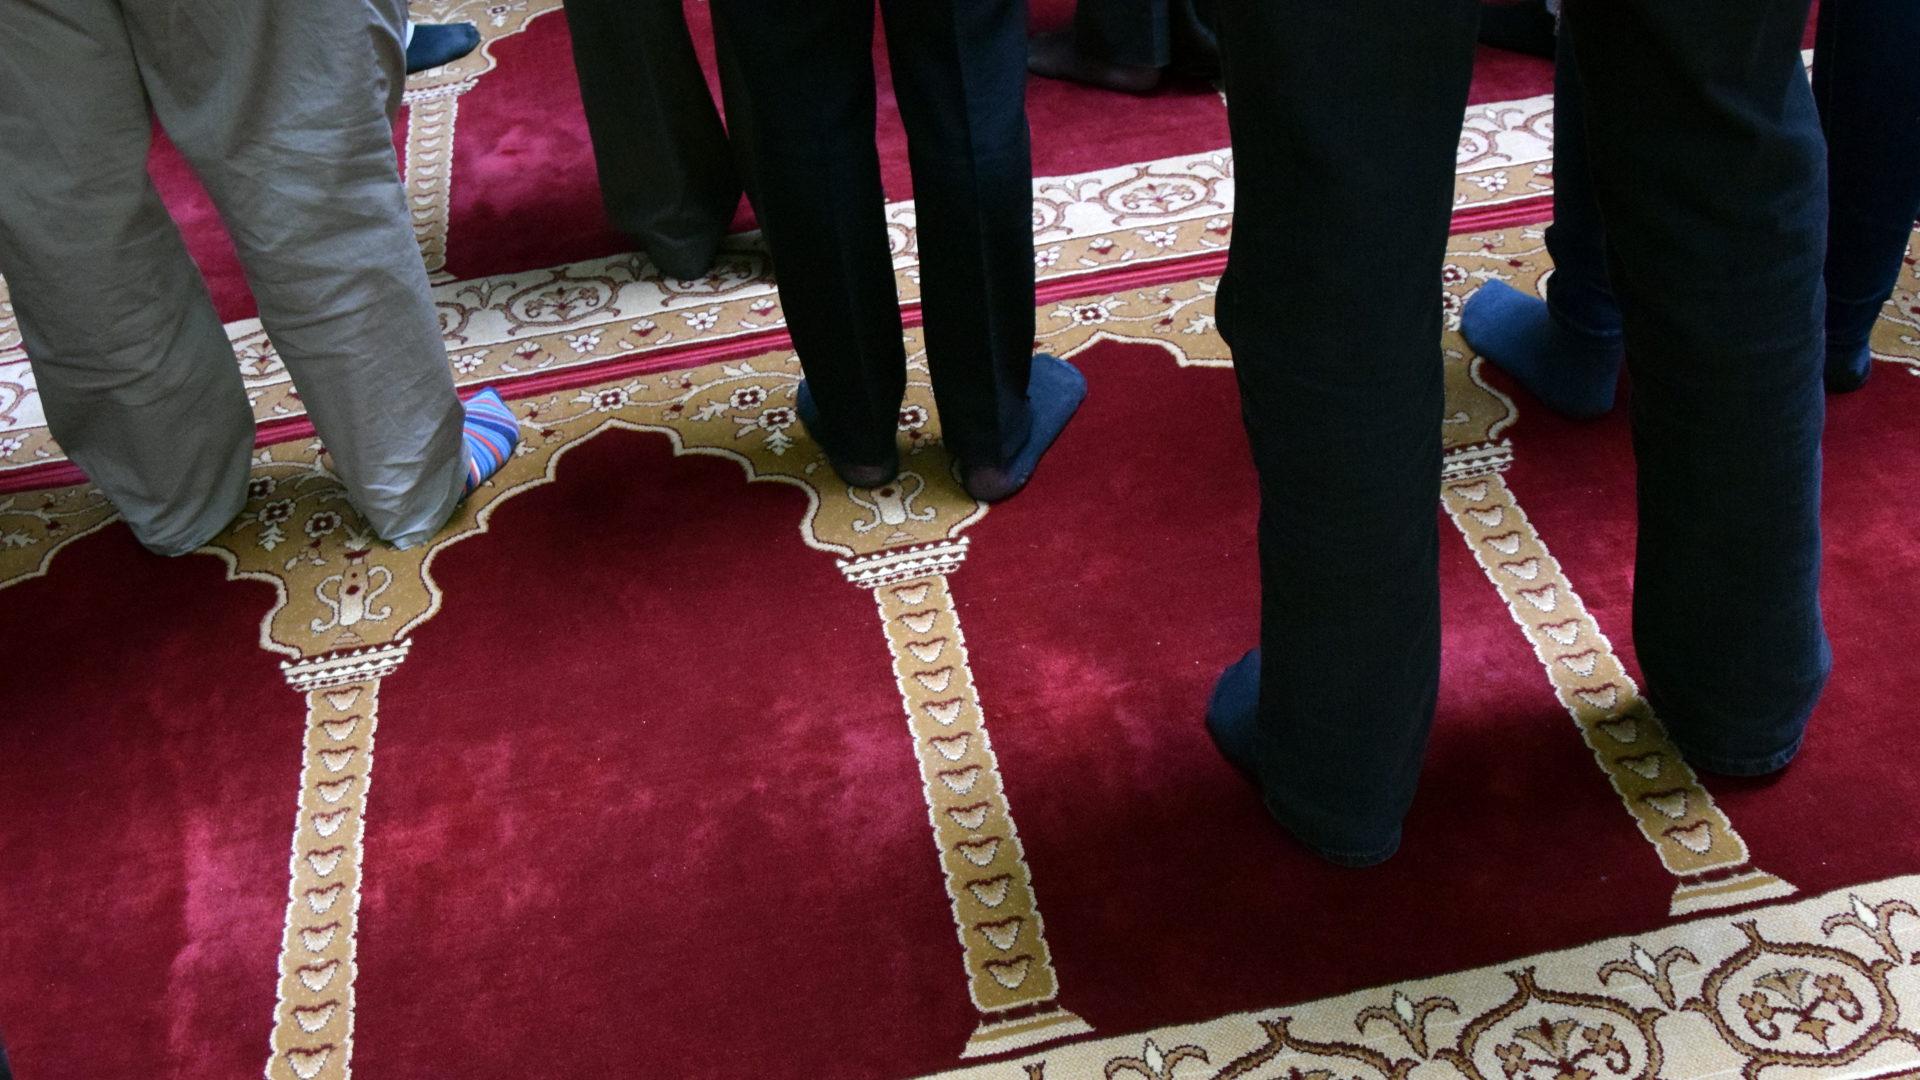 fleischmanns muslim Belonging nowhere: marginalization & radicalization risk among  belonging nowhere: marginalization & radicalization risk  hyphenated selves: muslim american.